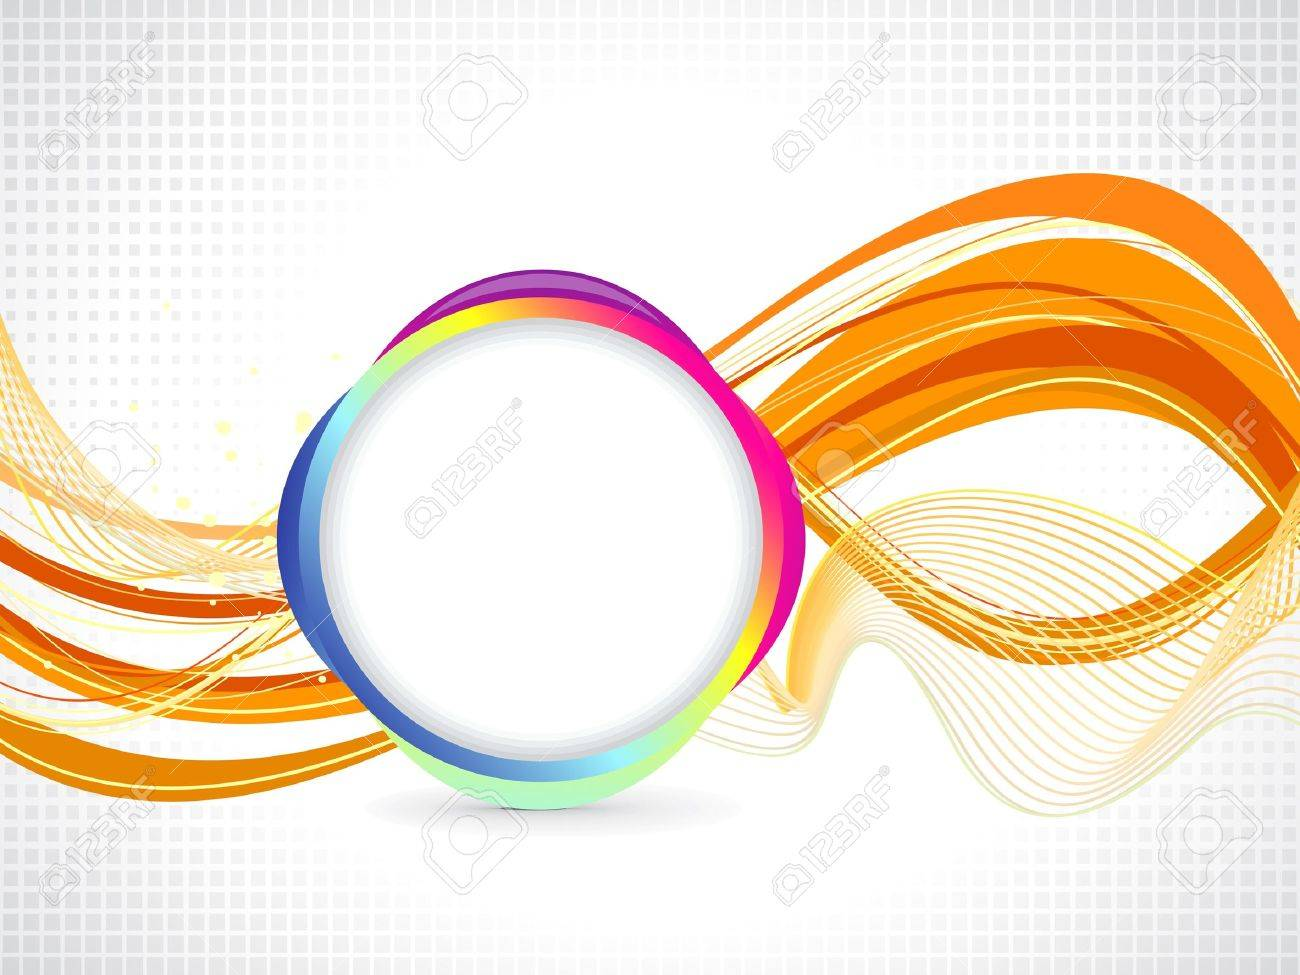 abstract orange based background illustration Stock Vector - 14087791